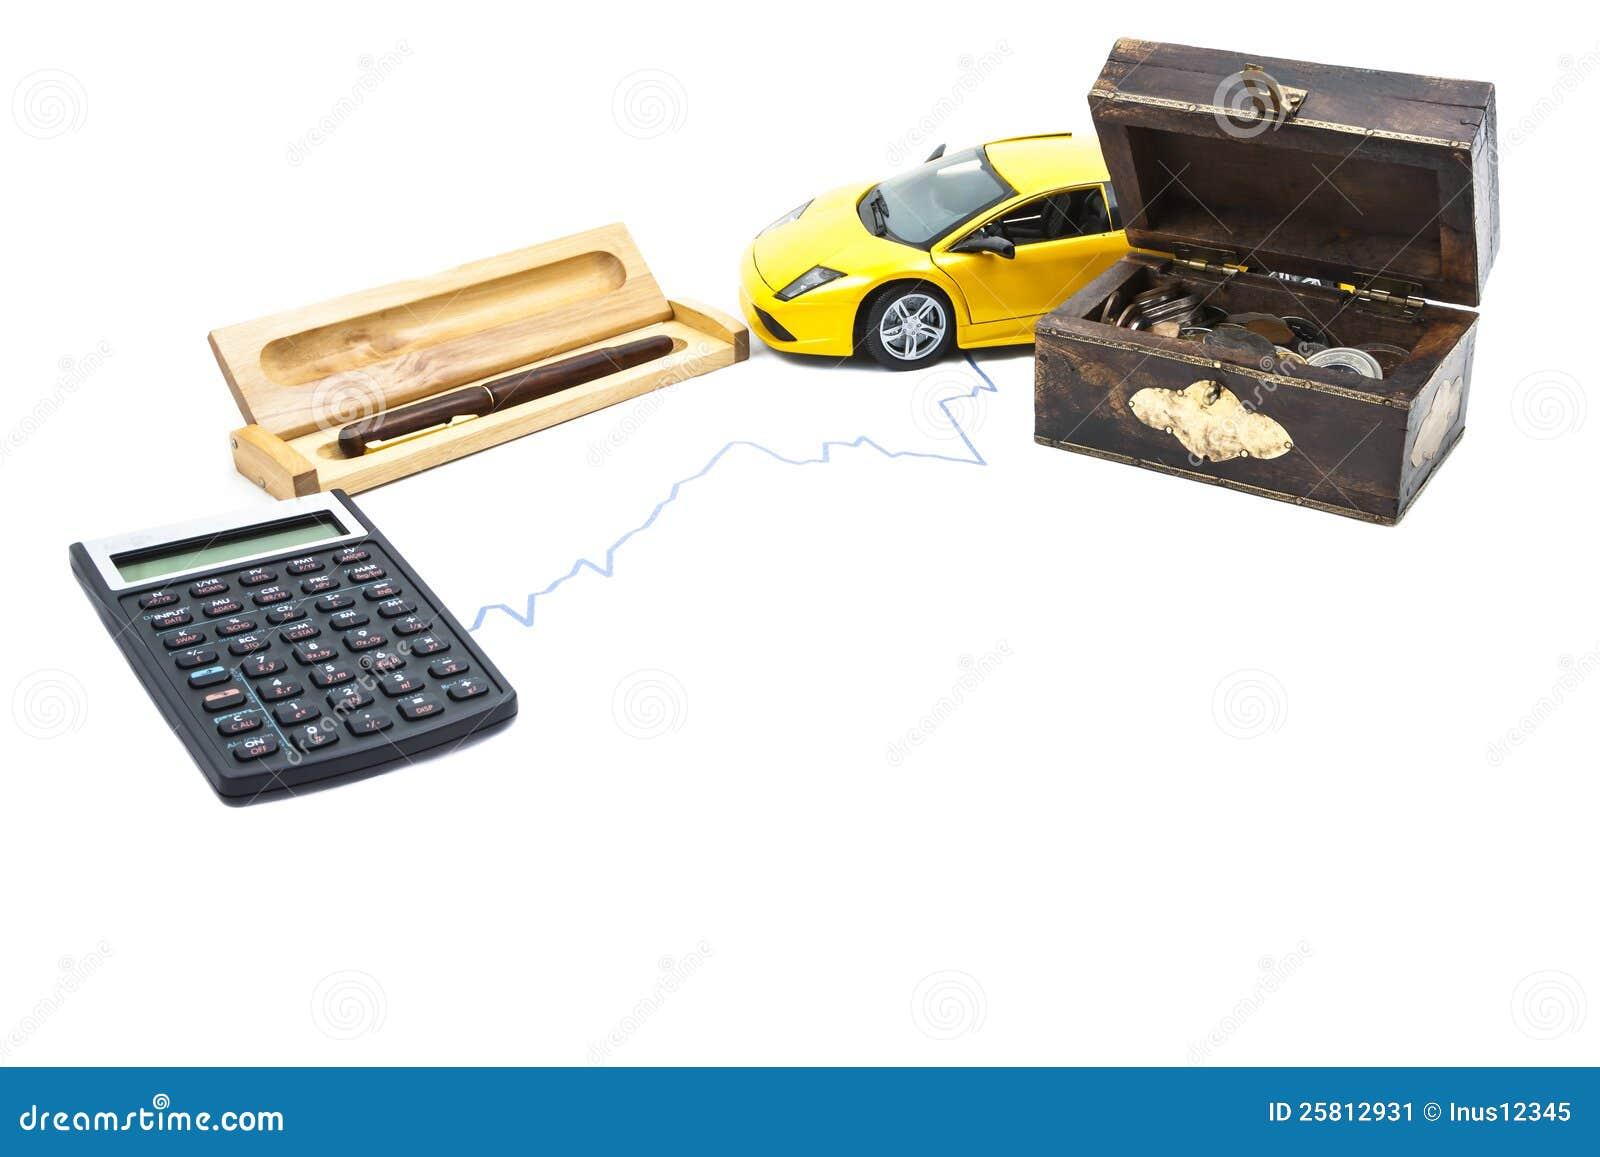 money car calculator and pen stock image image 25812931. Black Bedroom Furniture Sets. Home Design Ideas